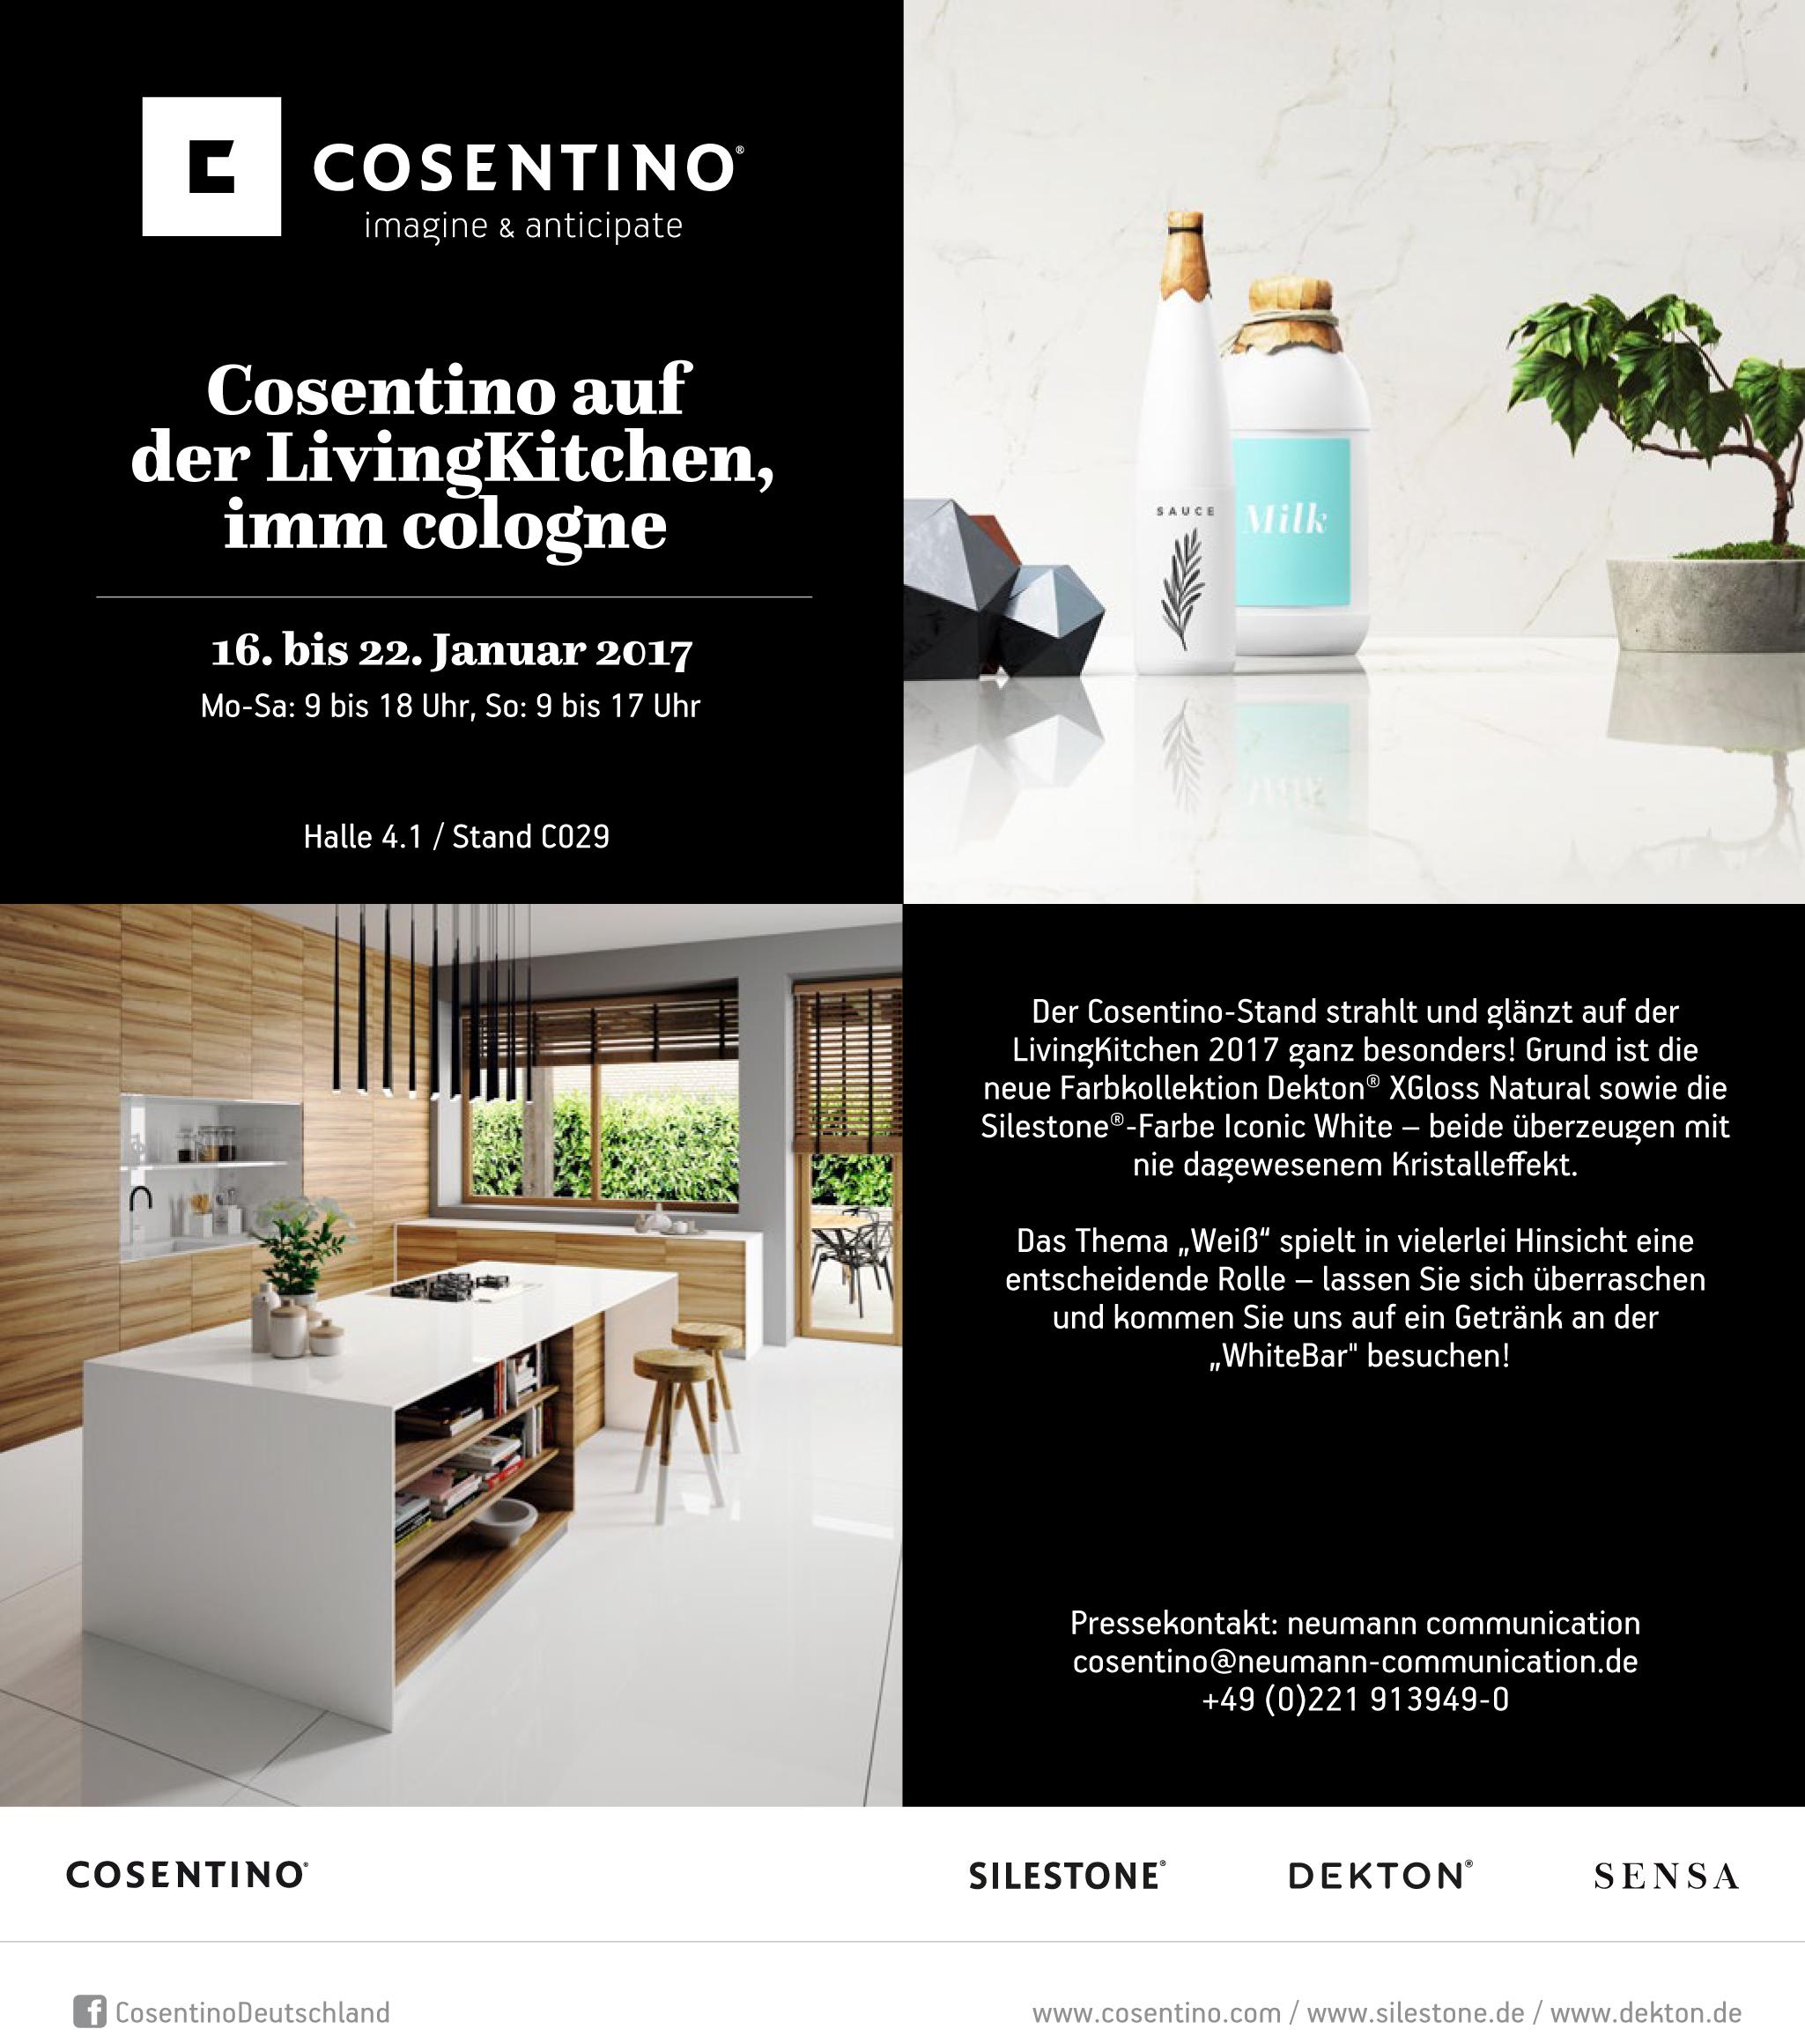 Cosentino Deutschland | Cosentino auf der LivingKitchen, imm cologne